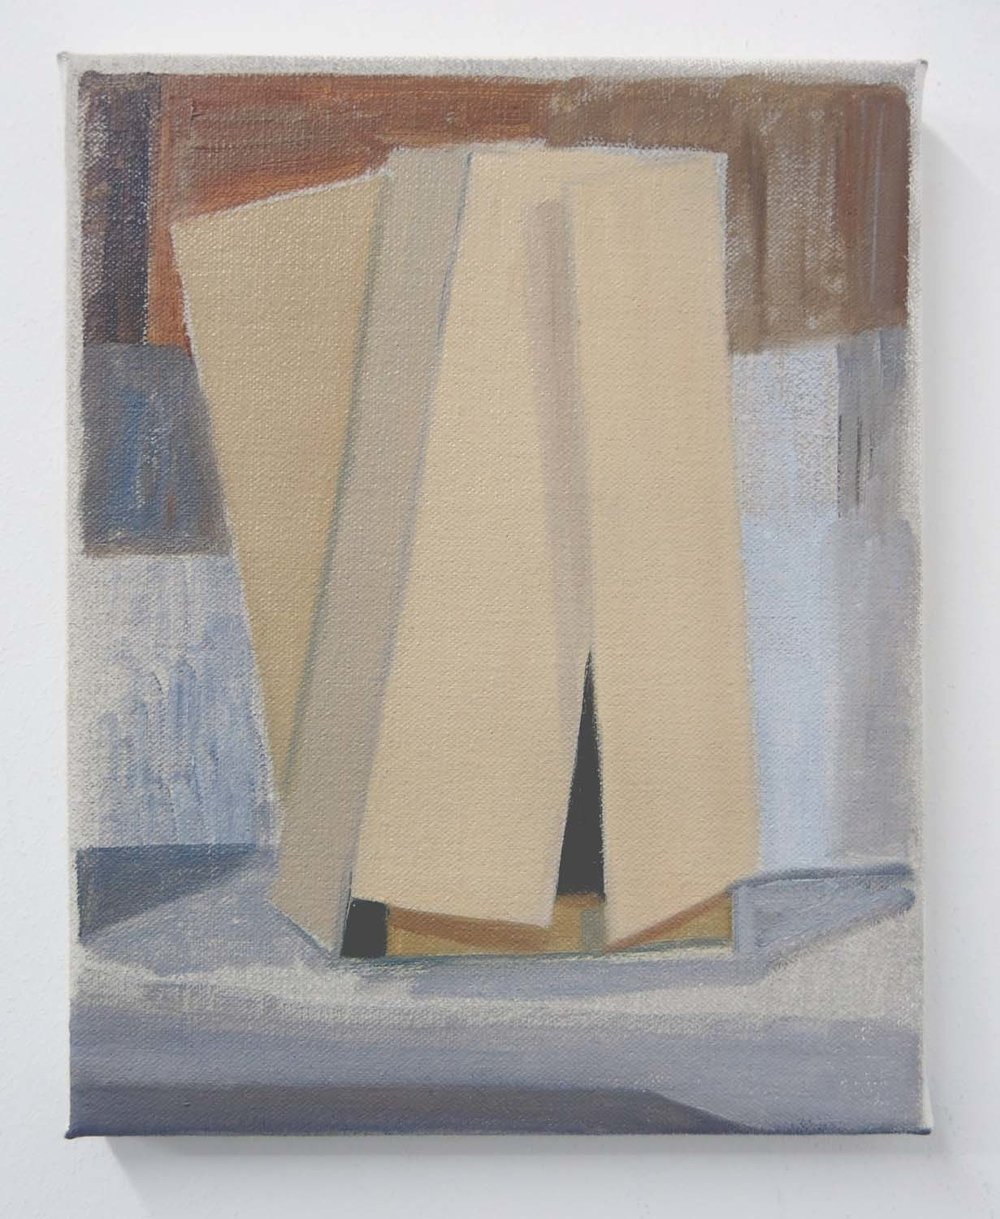 Wardrobe    2017, oil on canvas, 24 x 20cm